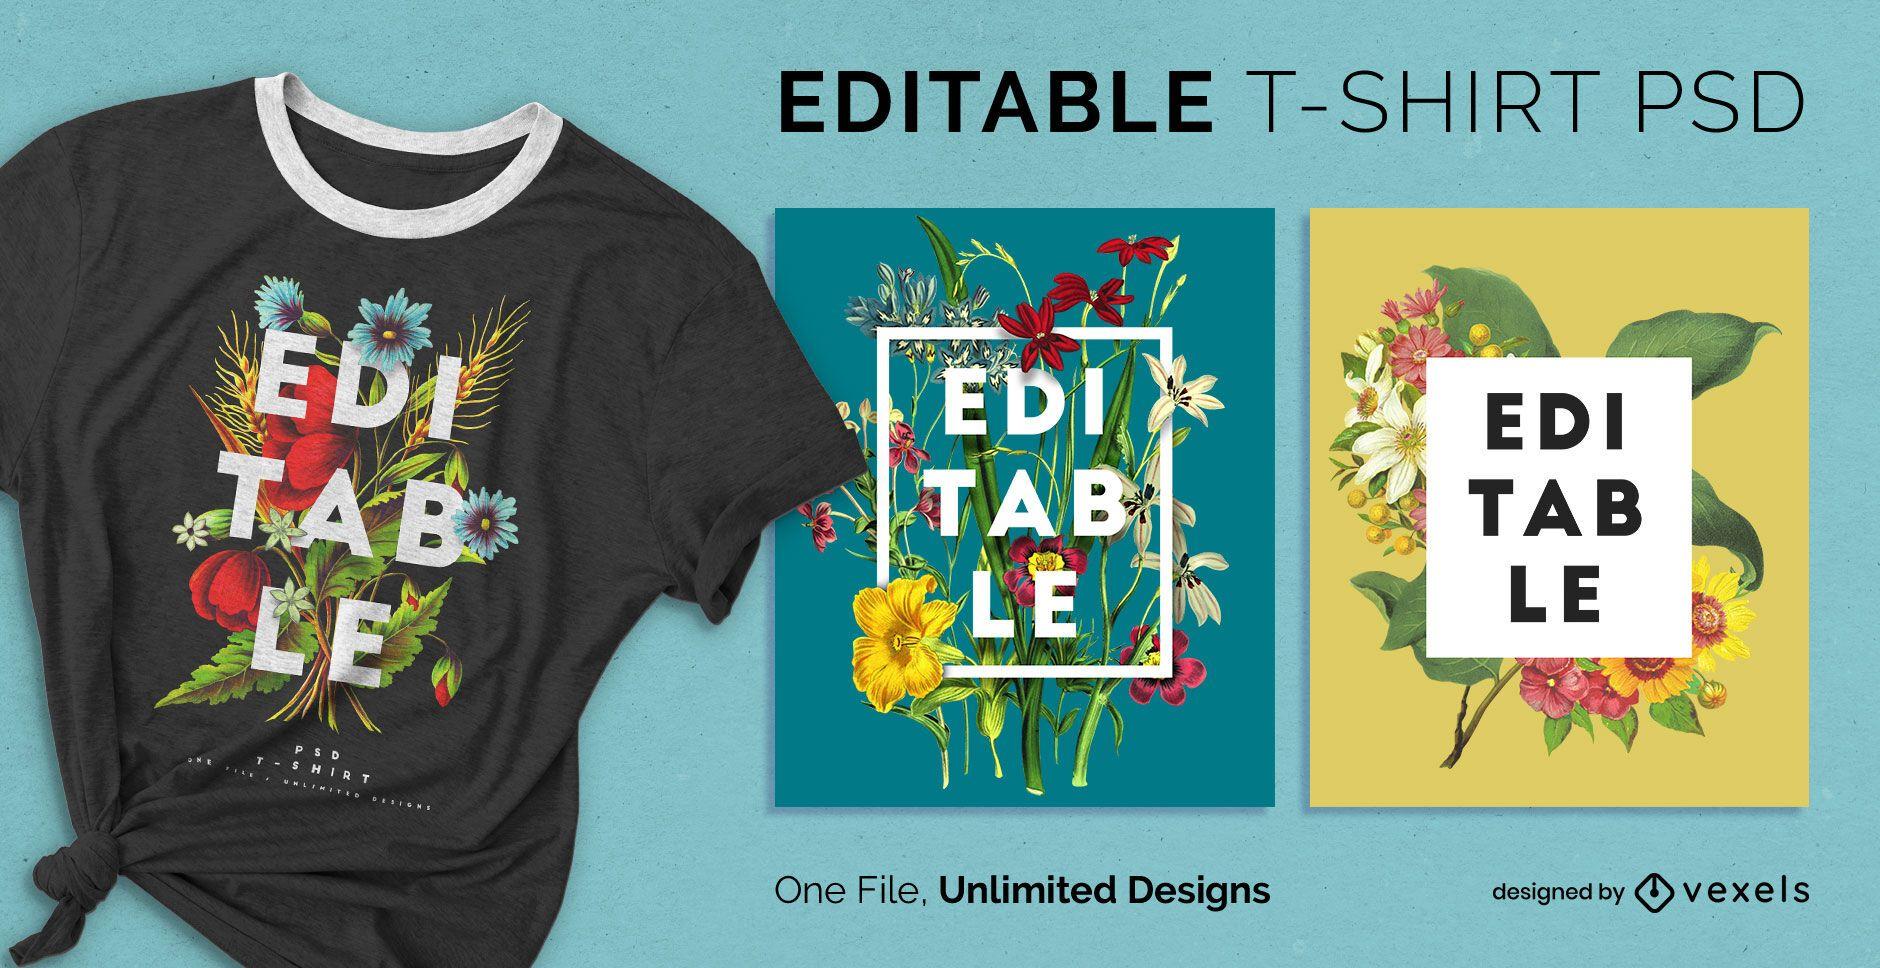 Blumen Natur skalierbares T-Shirt PSD